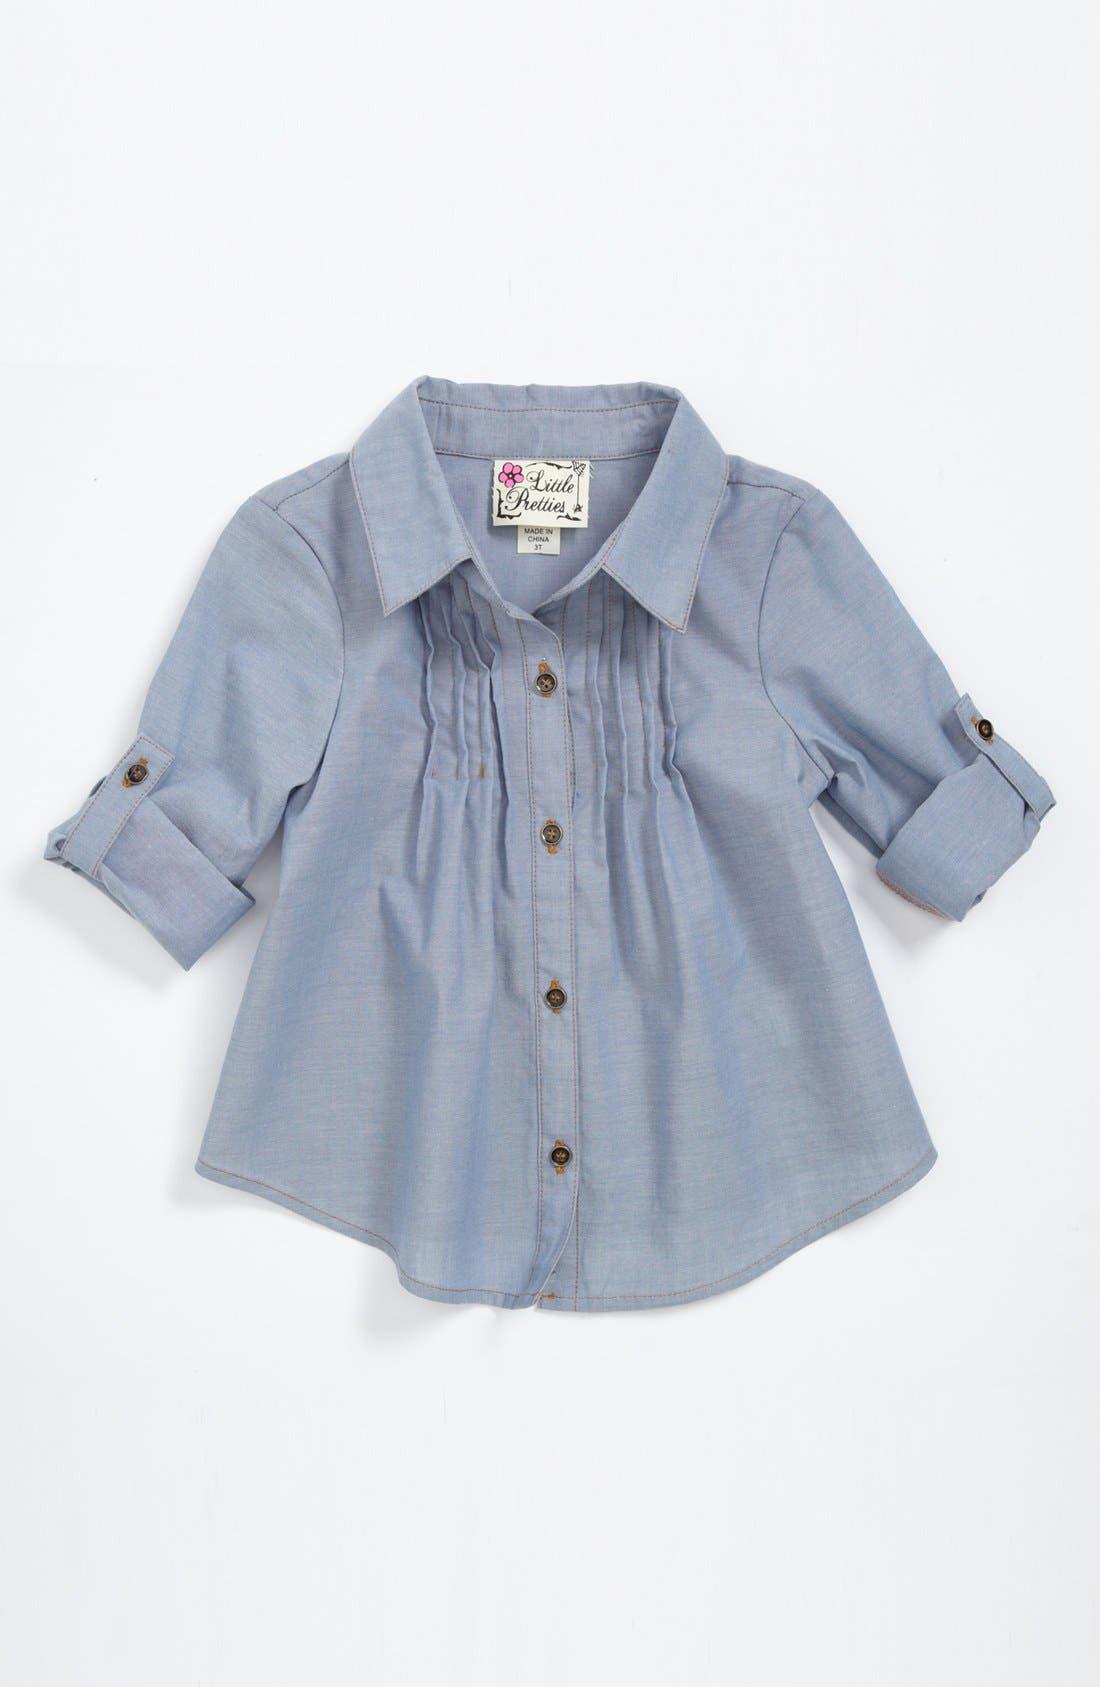 Main Image - Little Pretties Chambray Tunic (Toddler Girls)